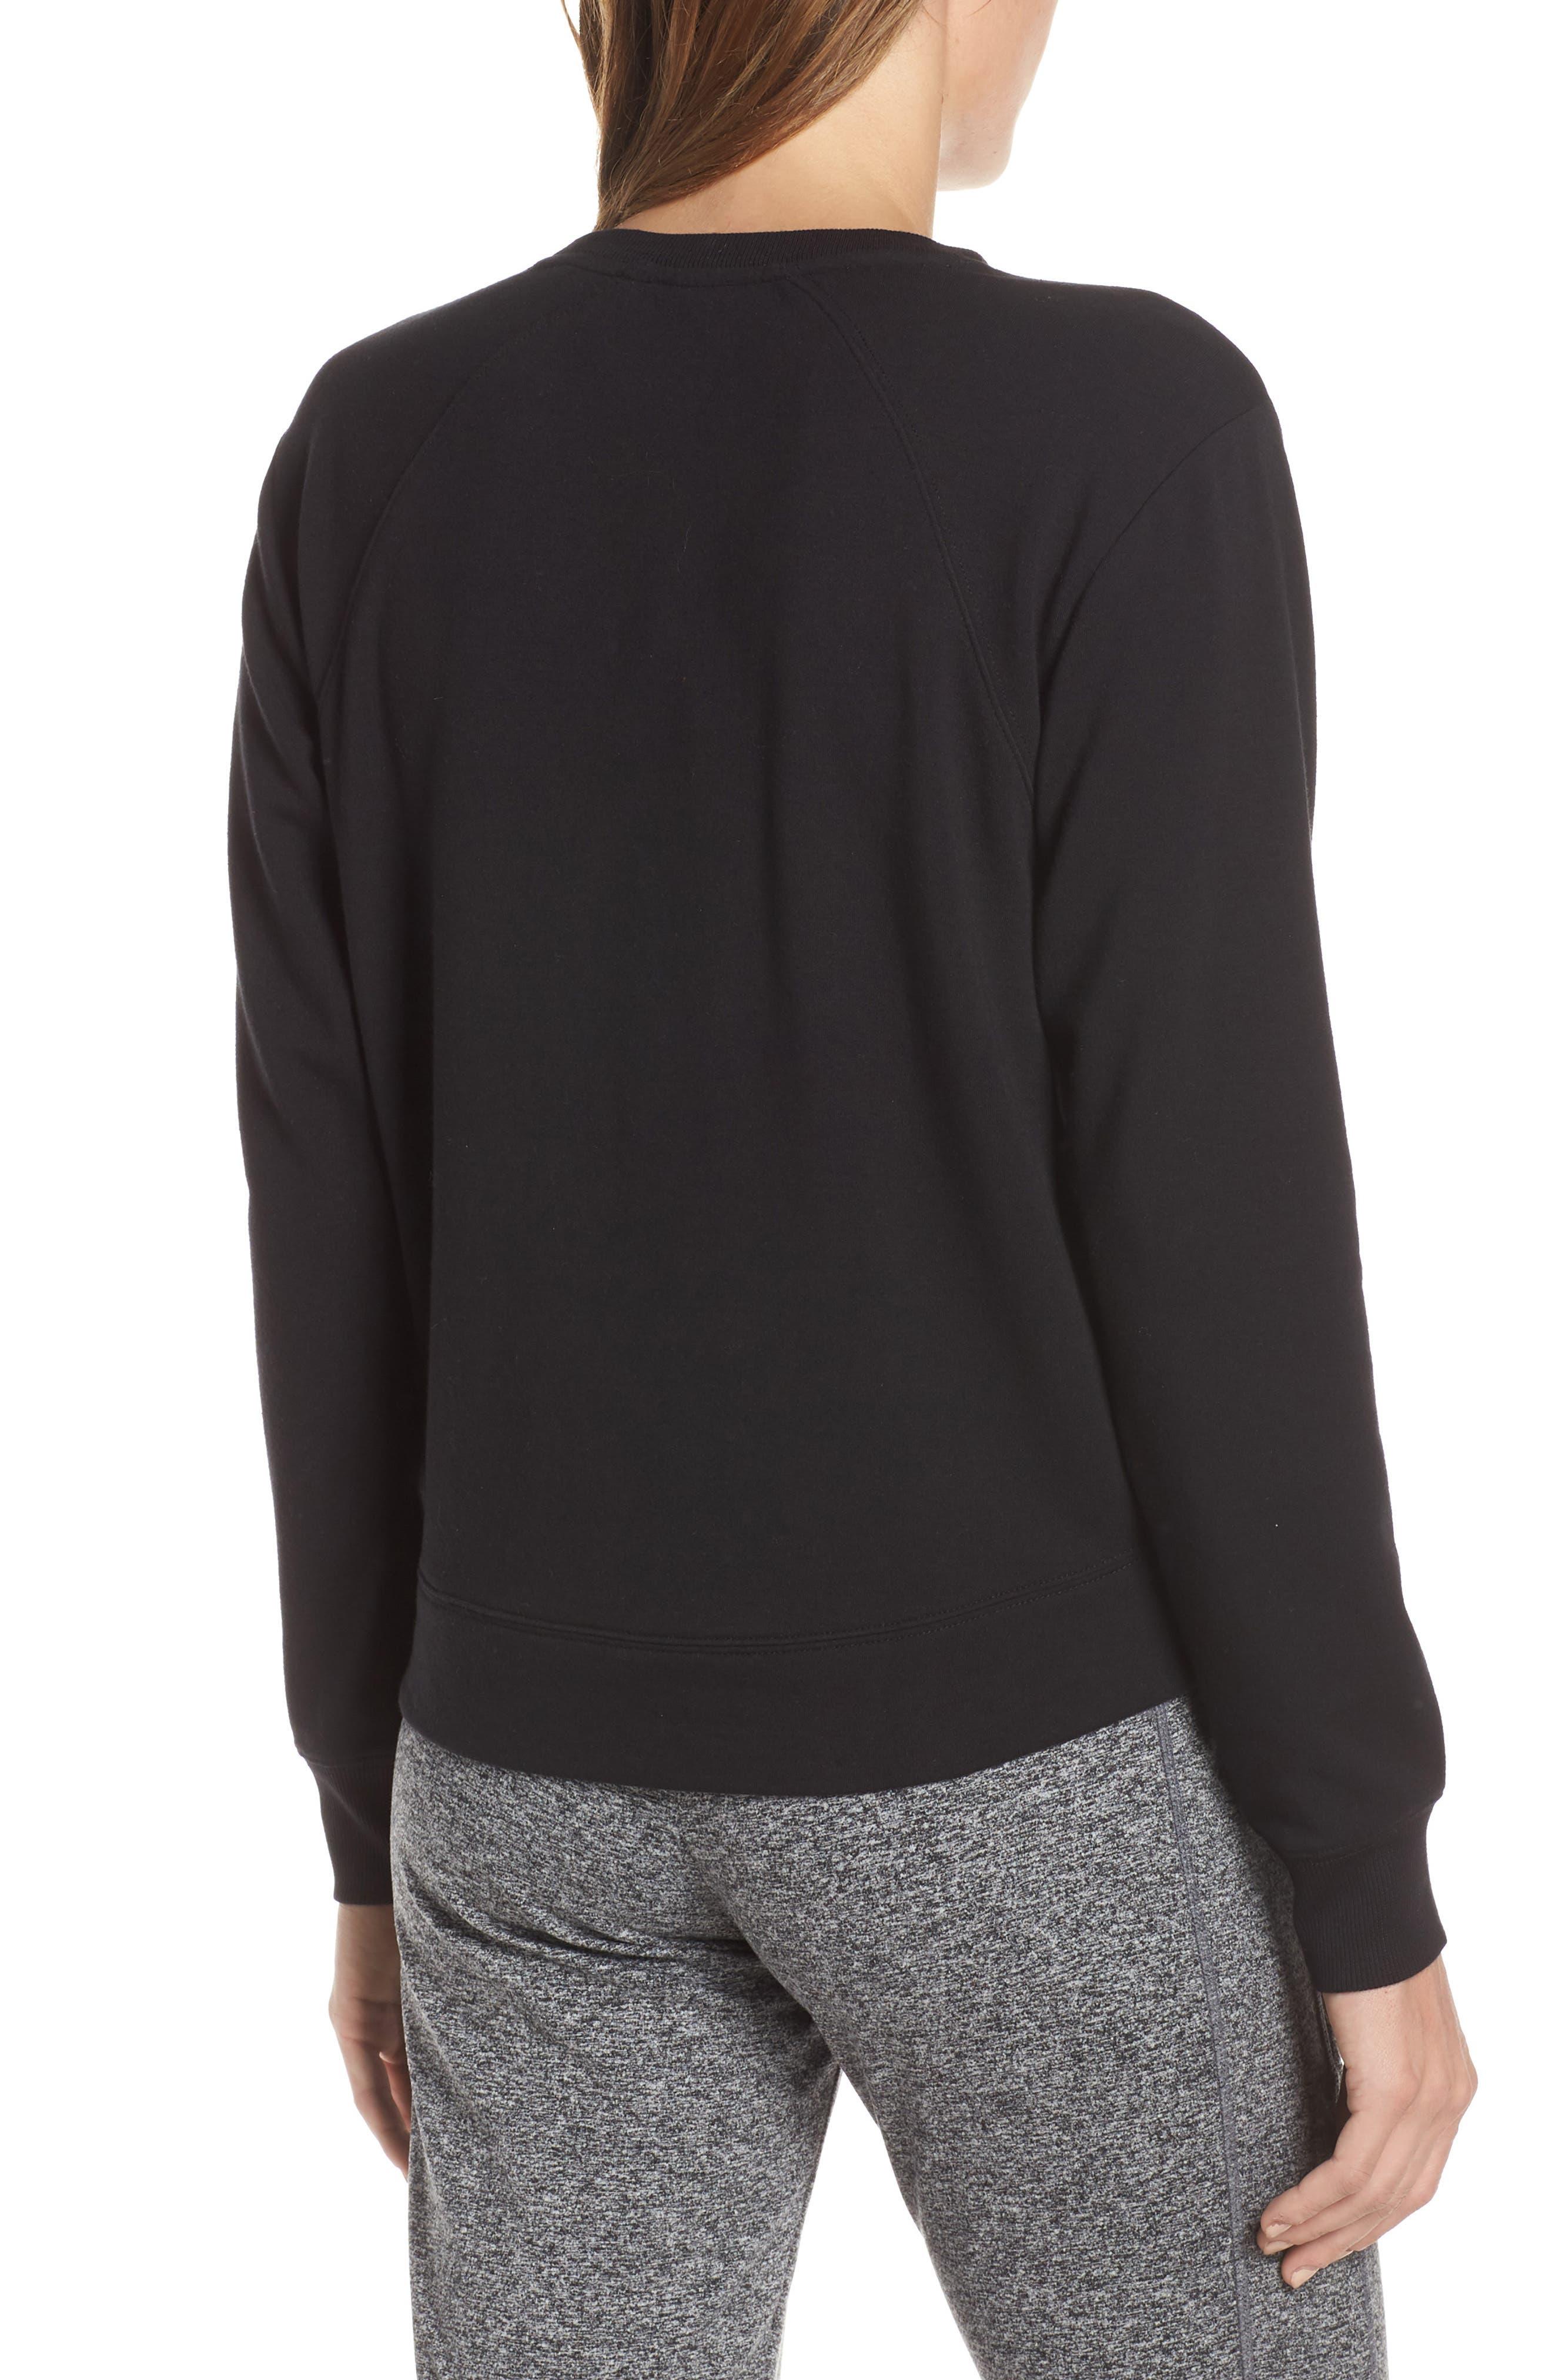 Uplifted Sweatshirt,                             Alternate thumbnail 2, color,                             001